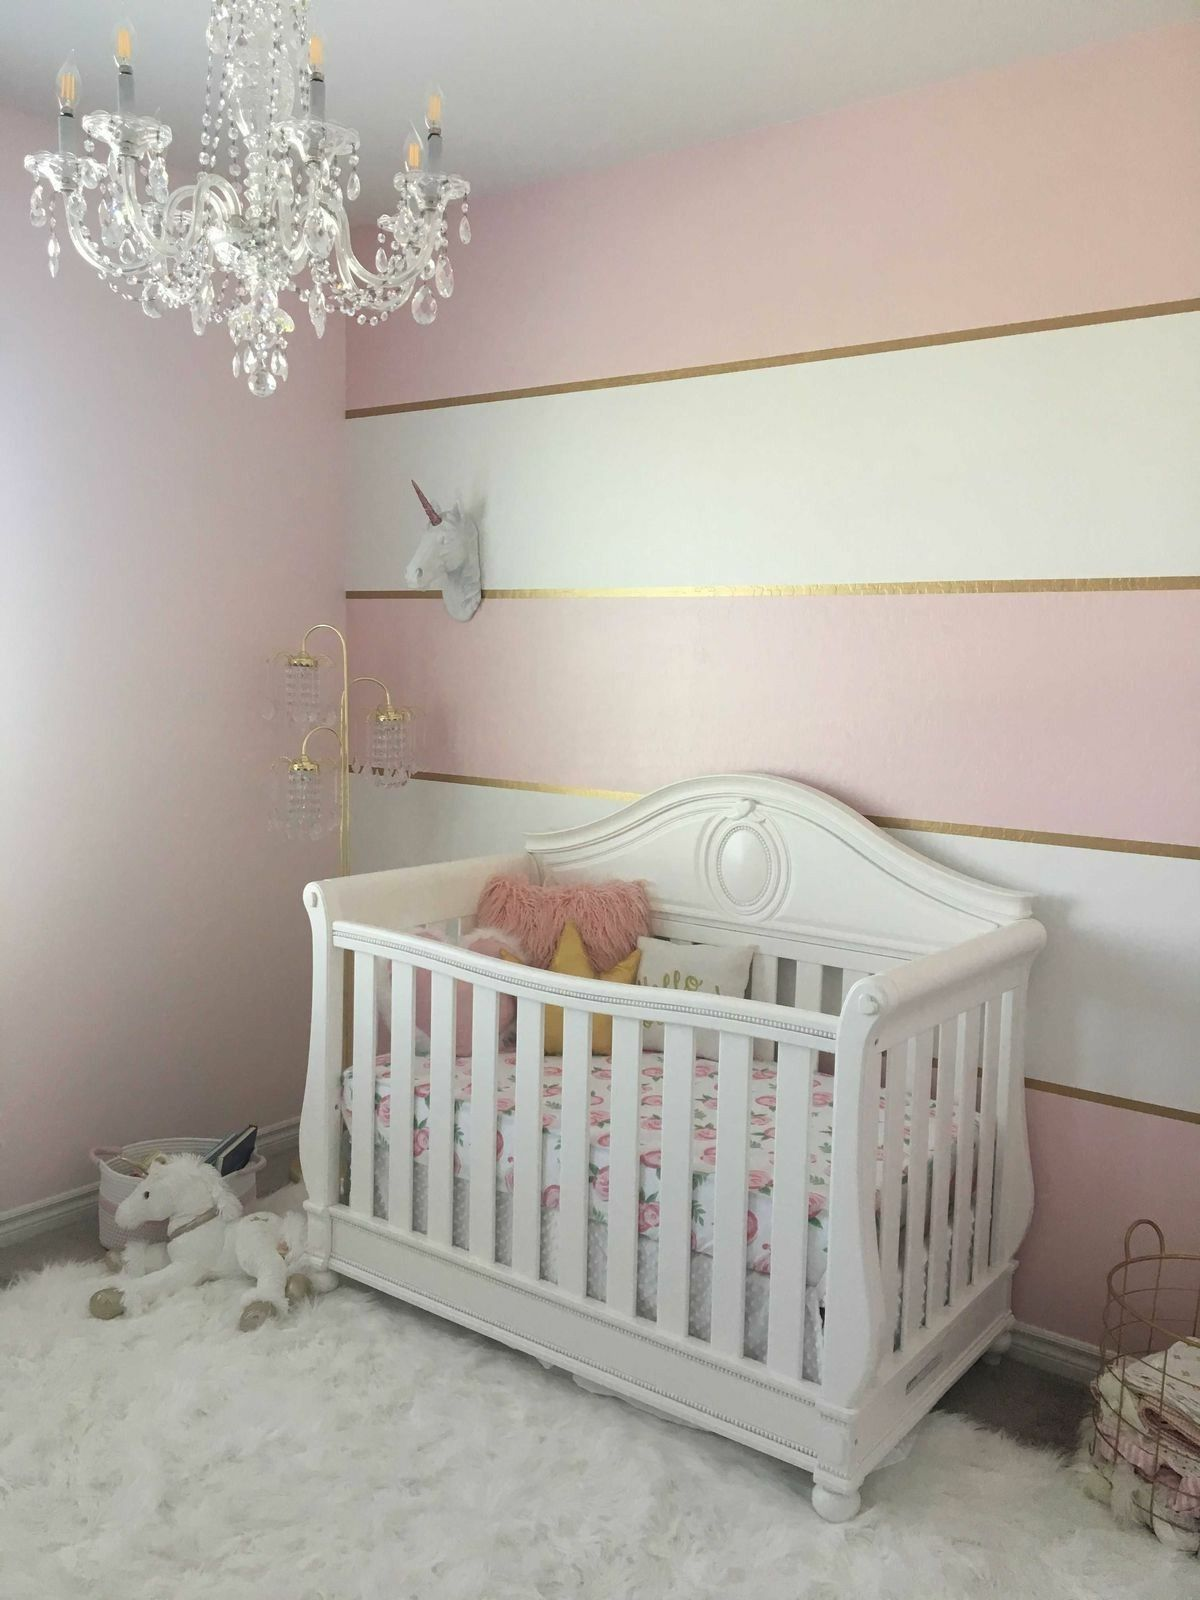 50 Cute Baby Nursery Ideas for Your Little Princes